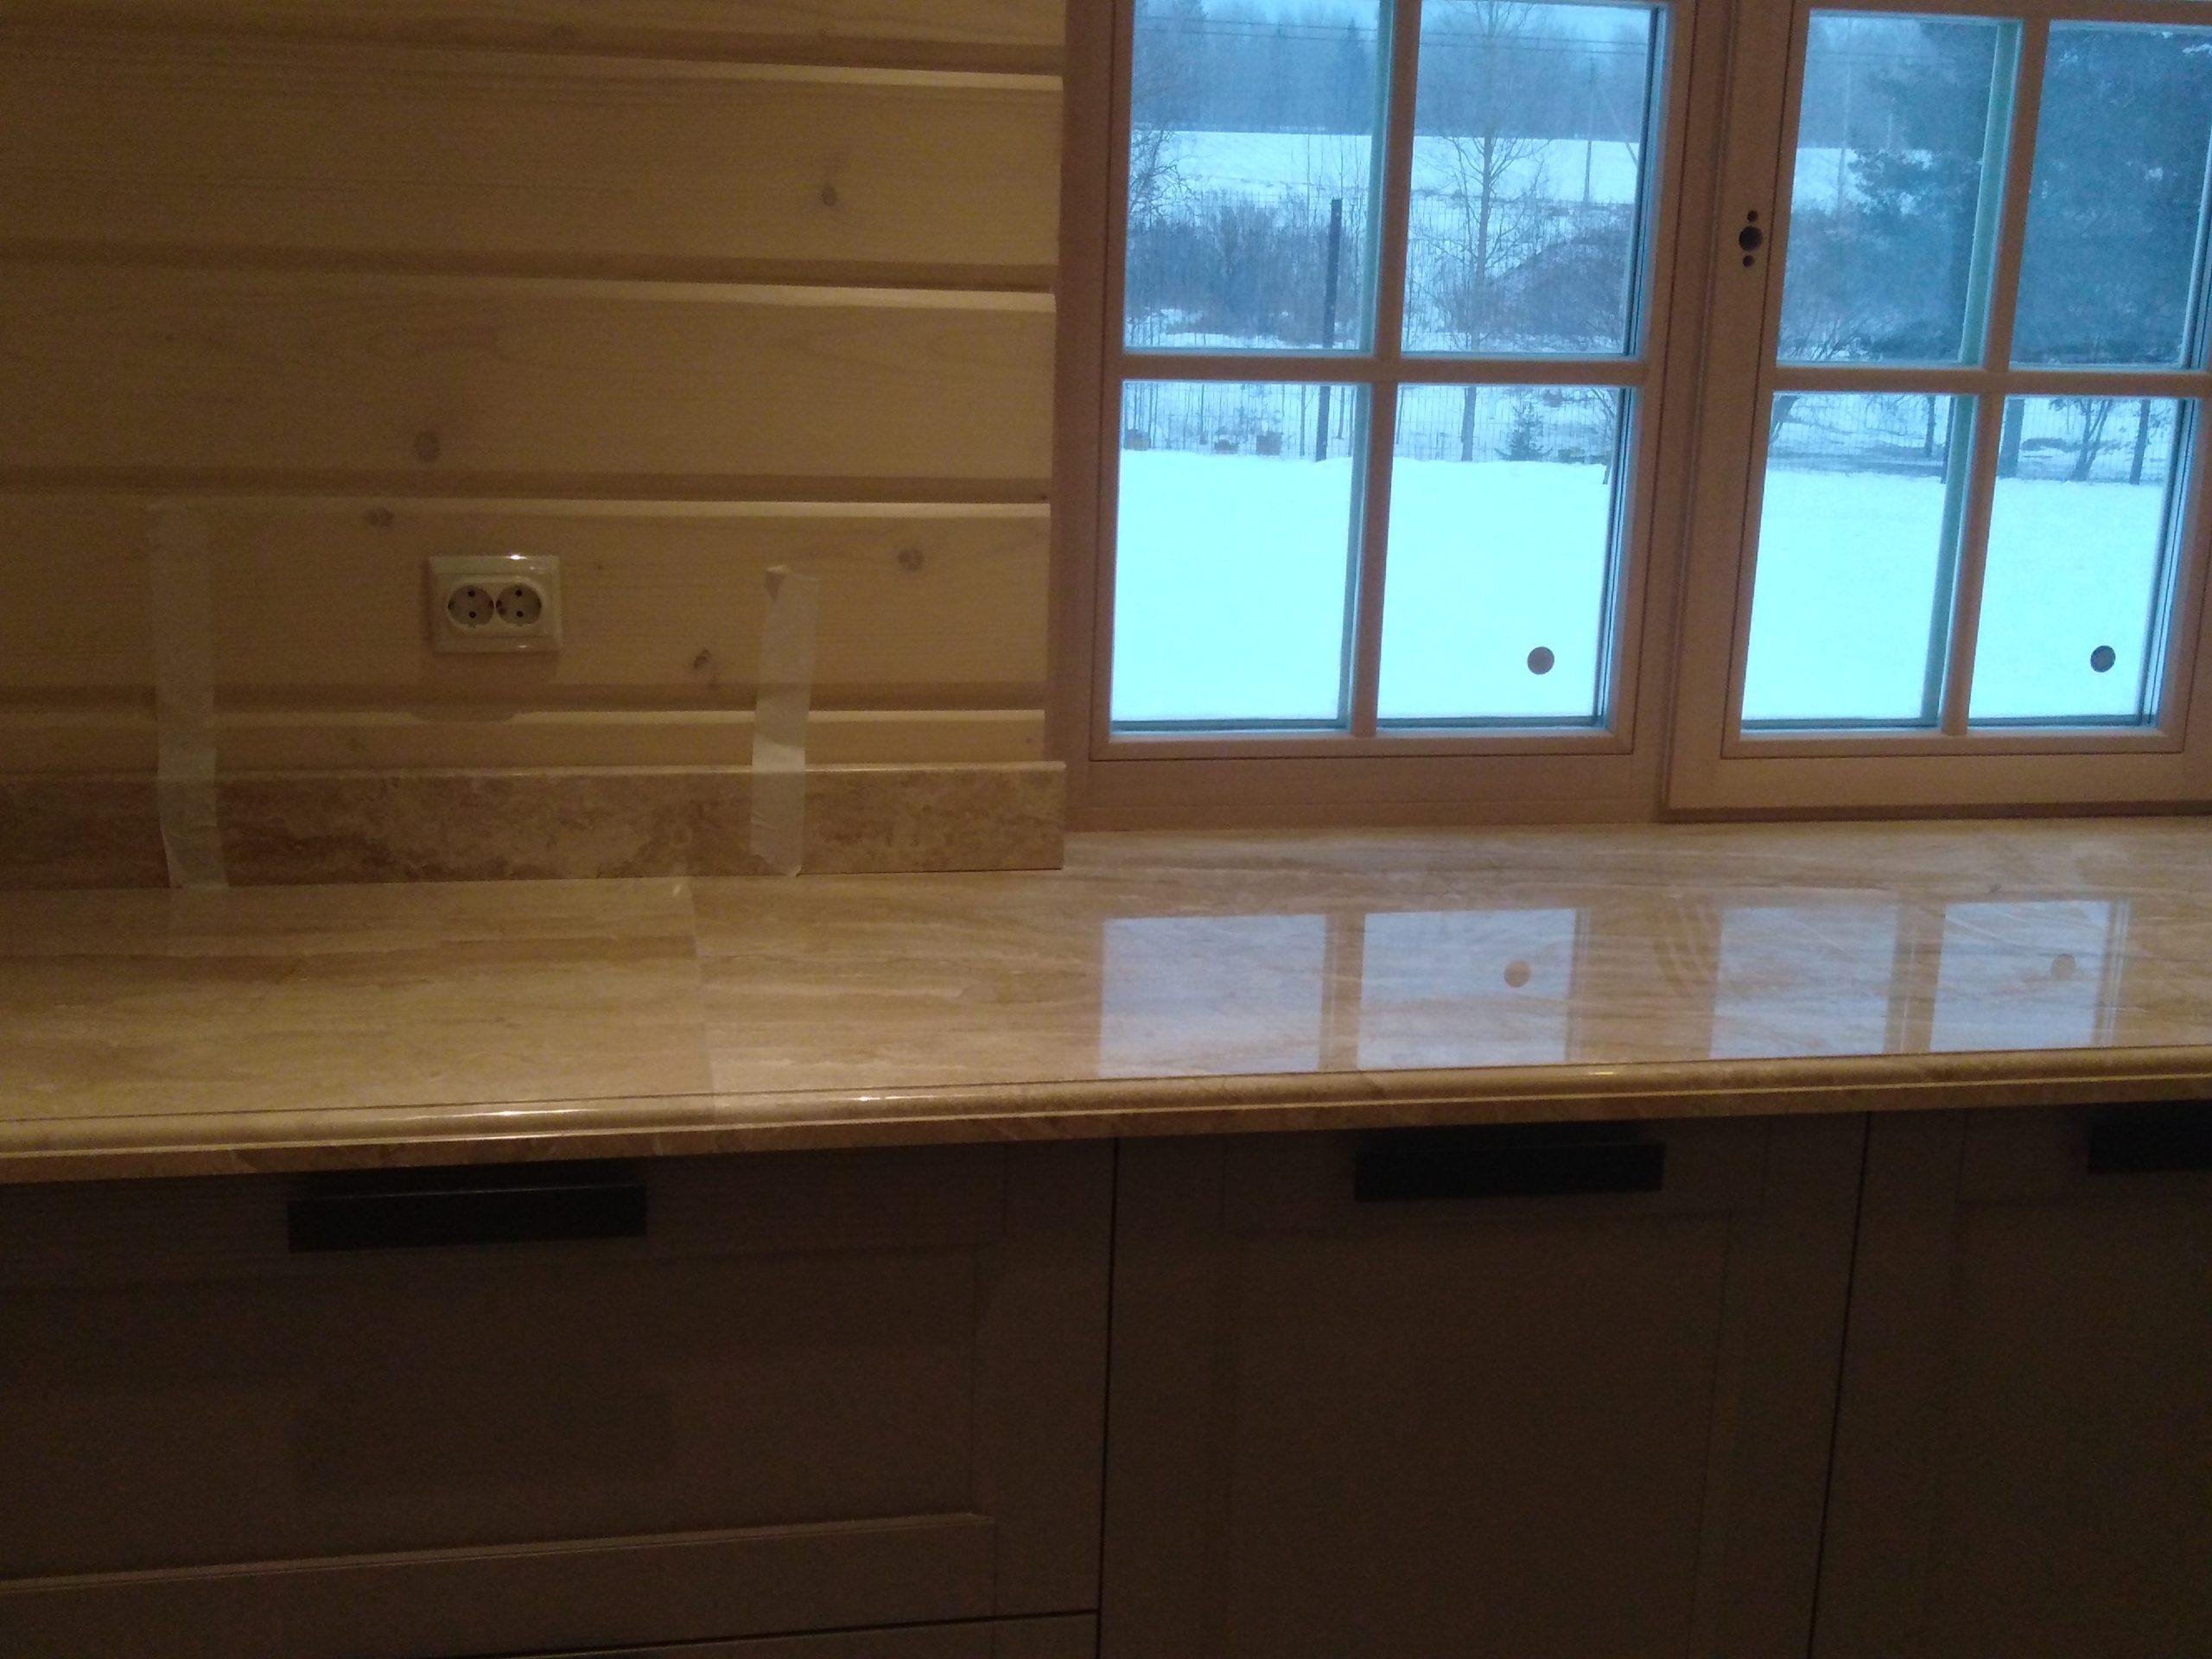 Столешница на кухню из итальянского мрамора Breccia Sardo